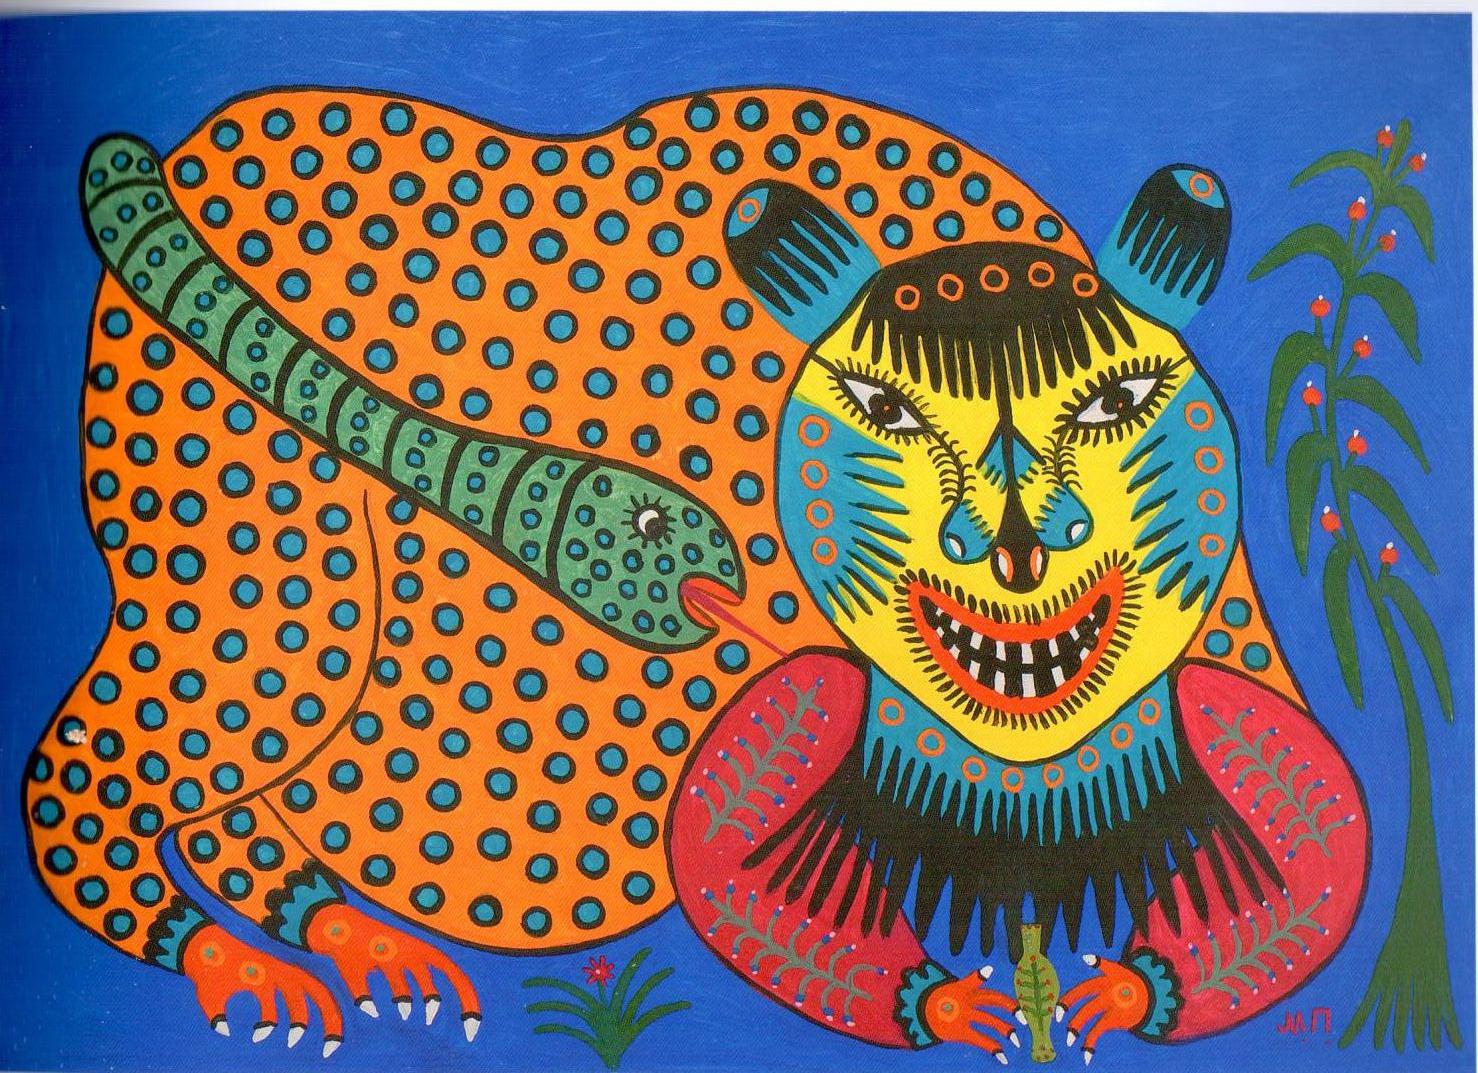 Maria Primachenko, While This Beast Drinks Poison, a Snake Sucks His Blood, 1982